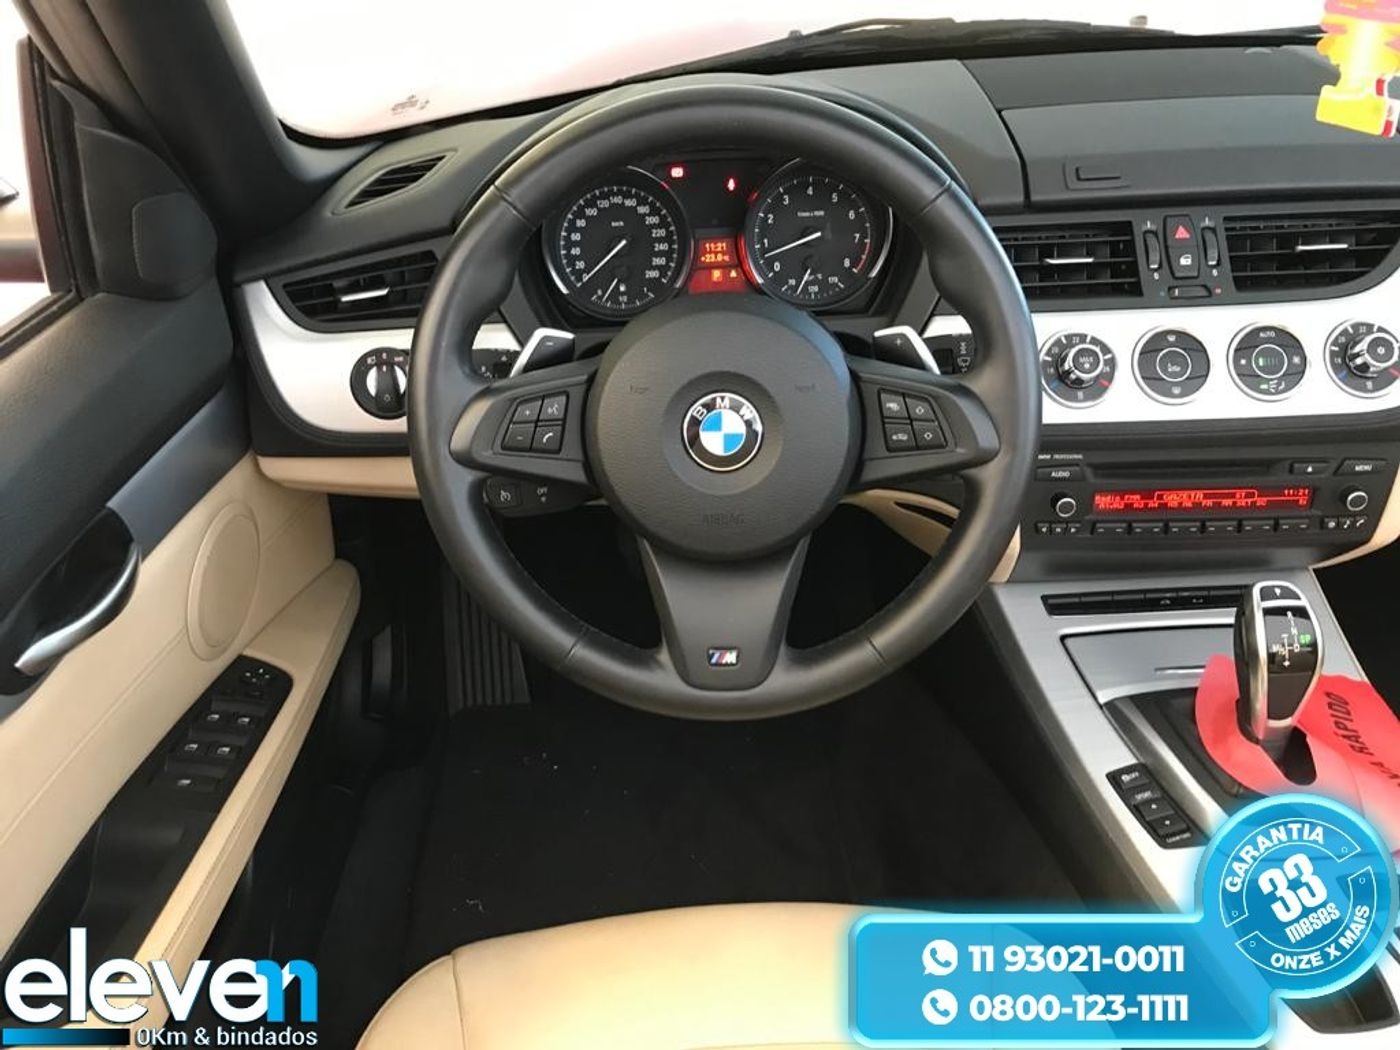 BMW Z4 Roadster sDRIVE 20i 2.0 16V 2p Aut.